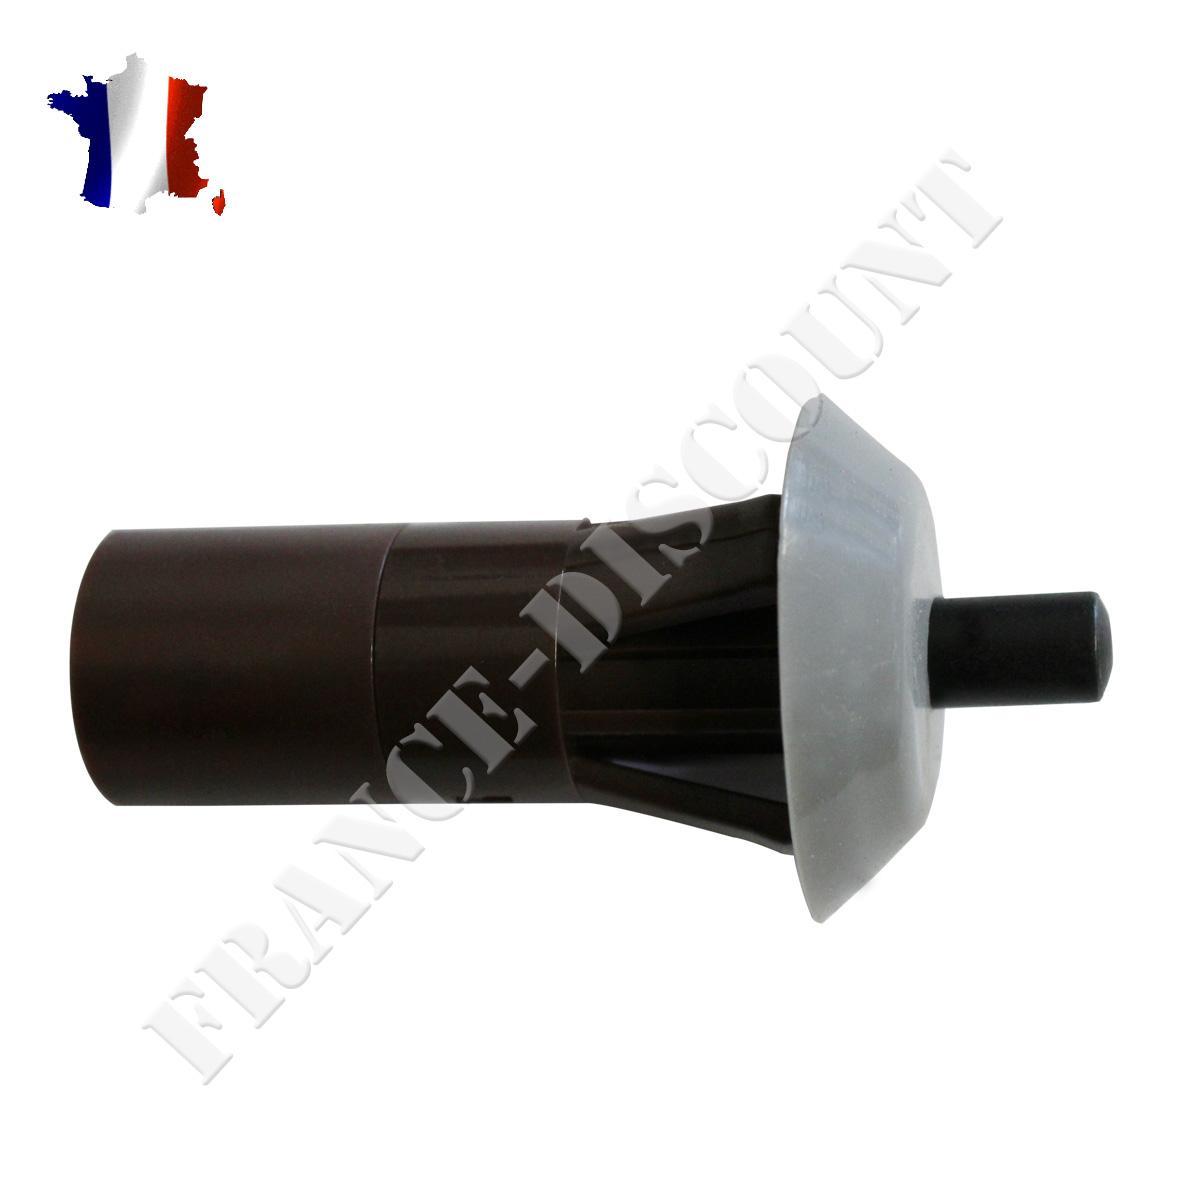 contacteur clairage plafonnier twingo clio 1 7700811152 ebay. Black Bedroom Furniture Sets. Home Design Ideas